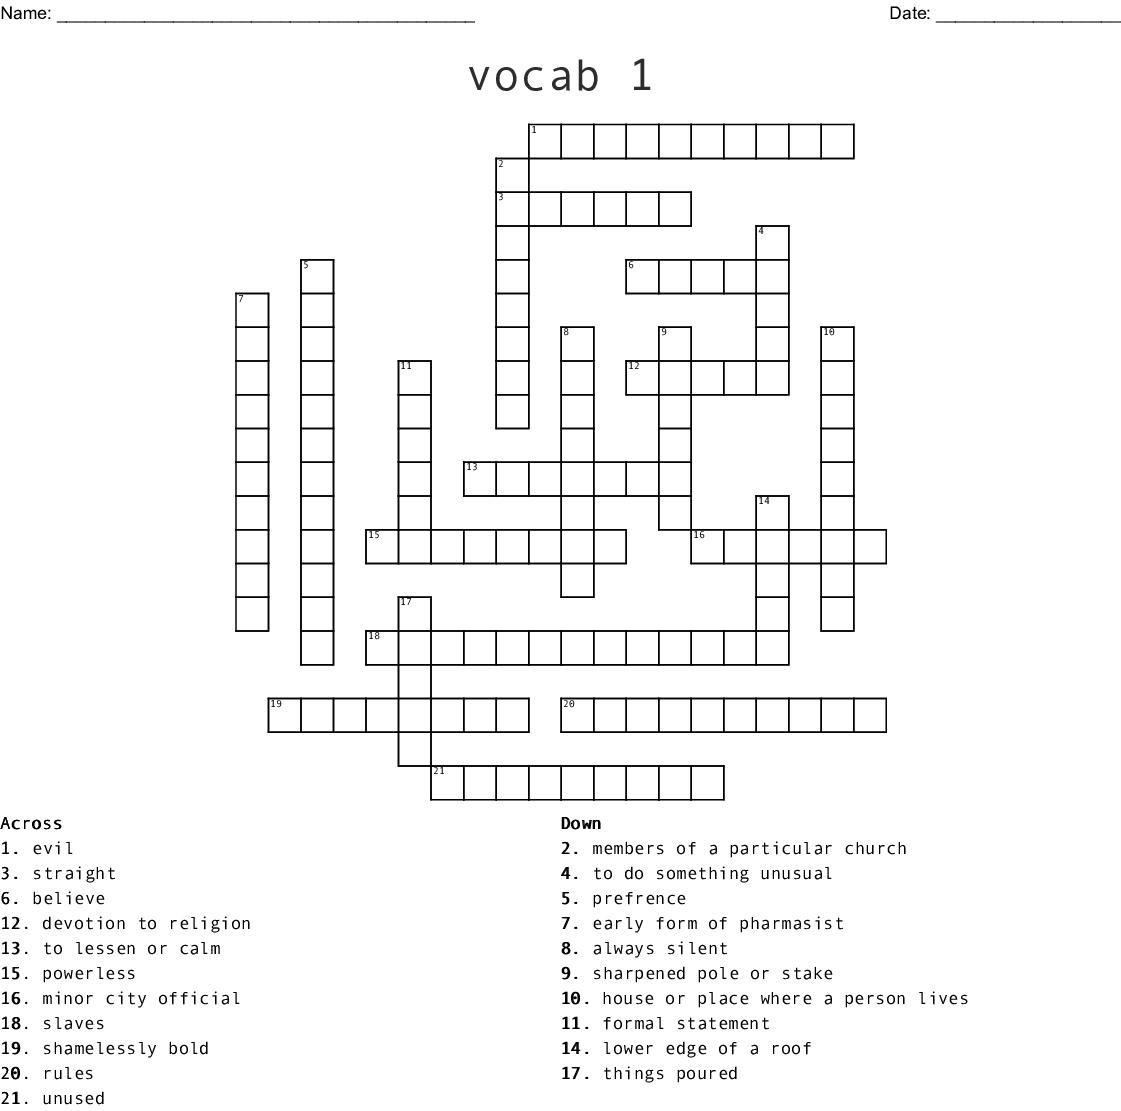 To Kill A Mockingbird Ch 1 Vocab Crossword Wordmint